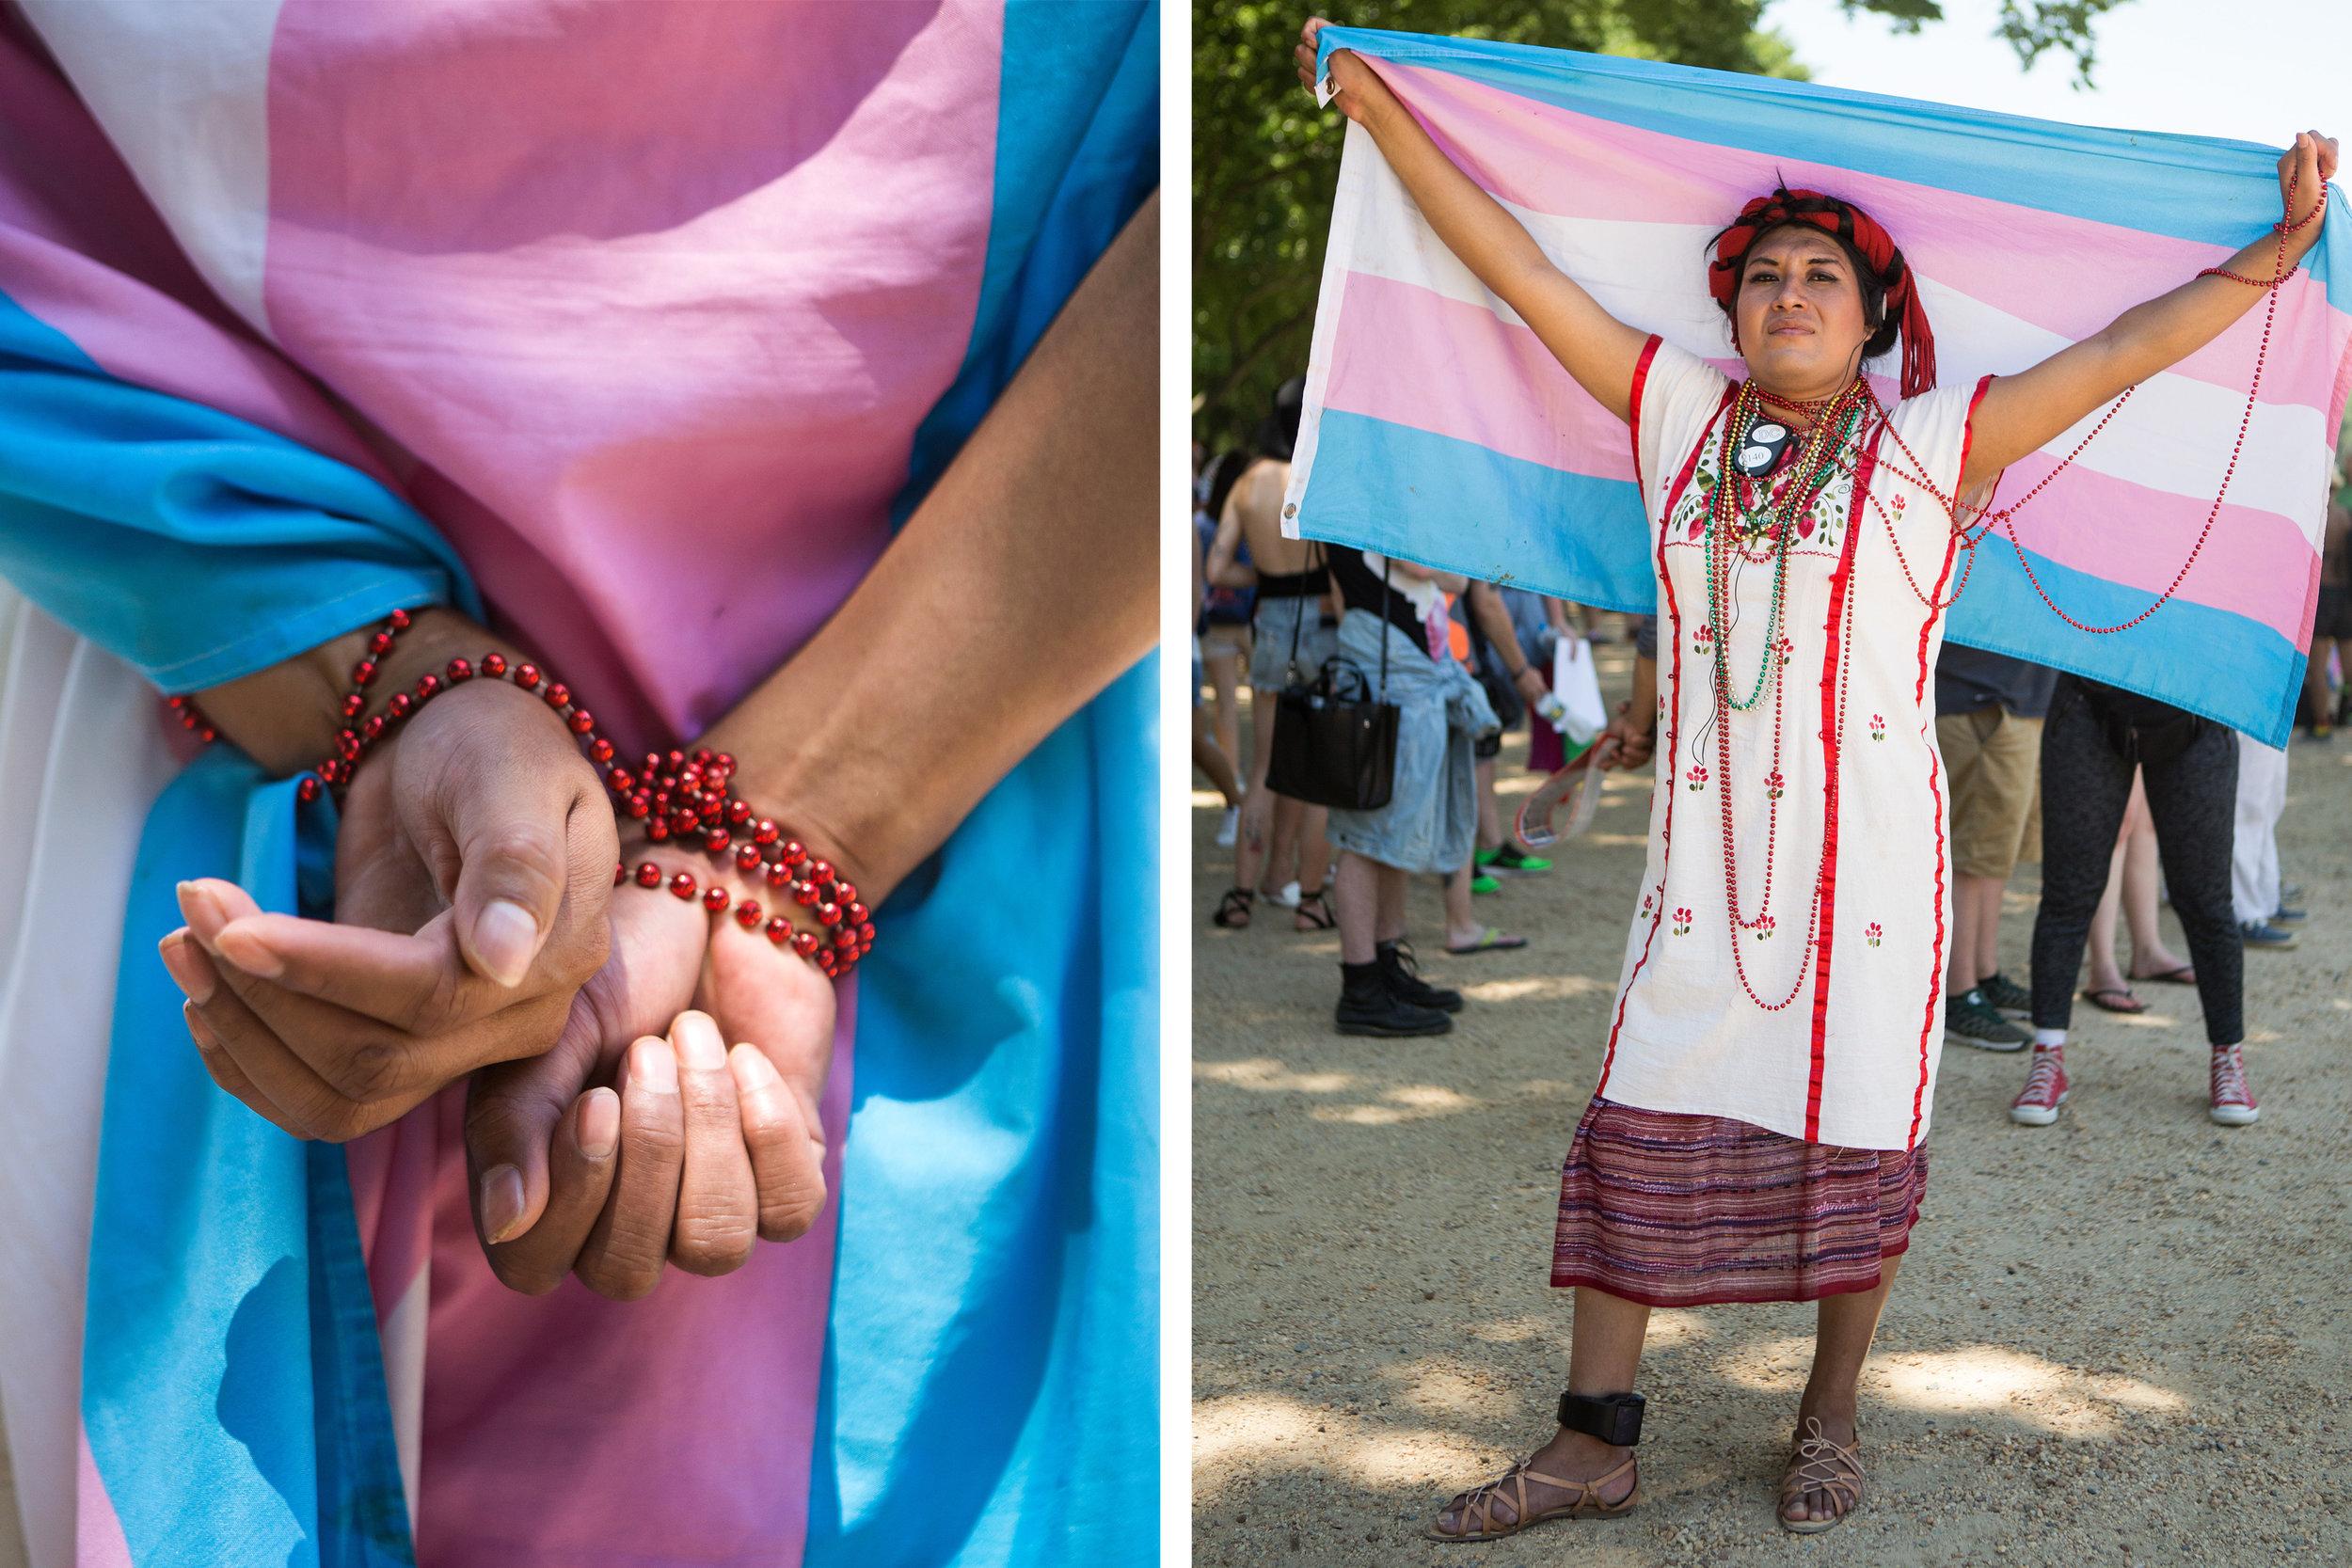 Estrellia Sanchez, a transgender woman from Atlanta.  (Liam James Doyle/NPR)